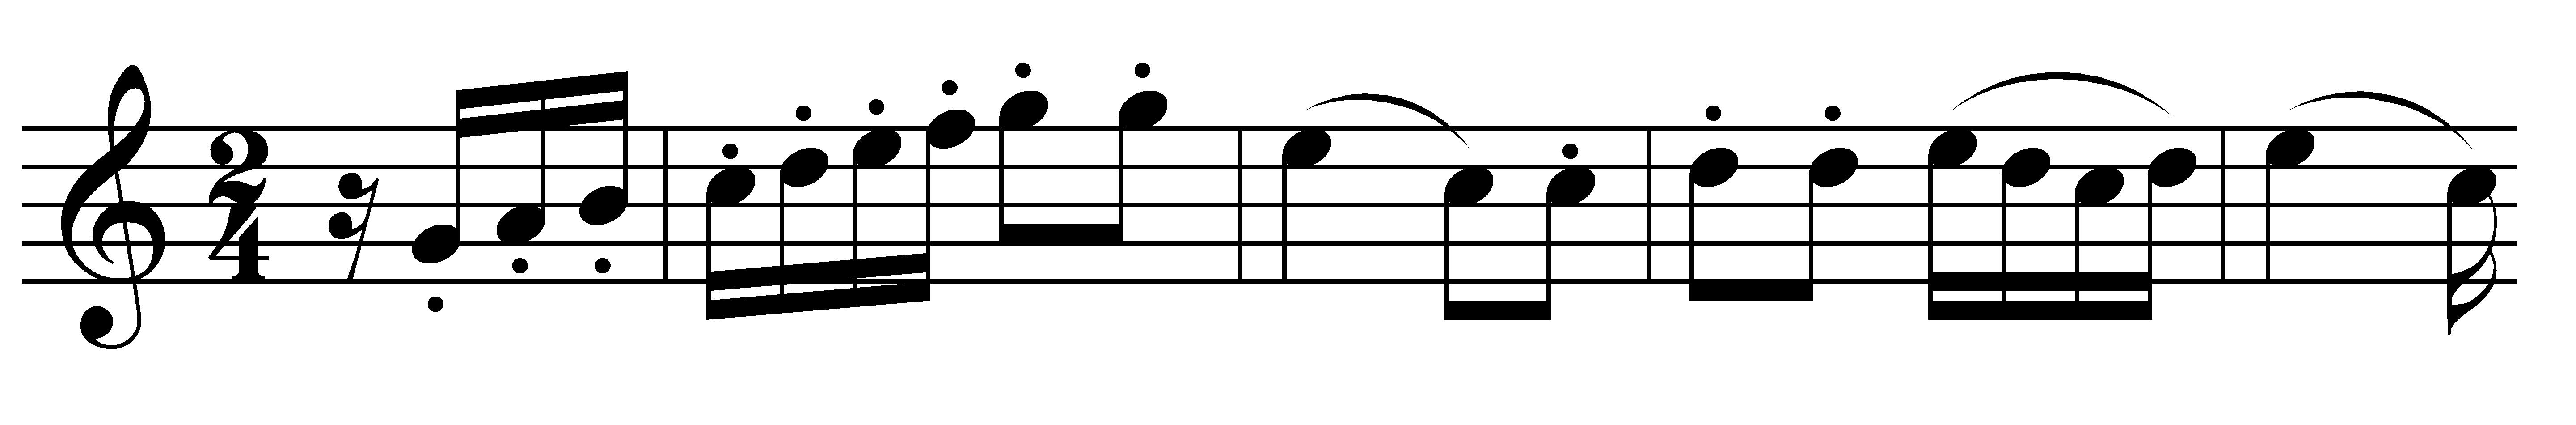 PNG Symphony - 56892